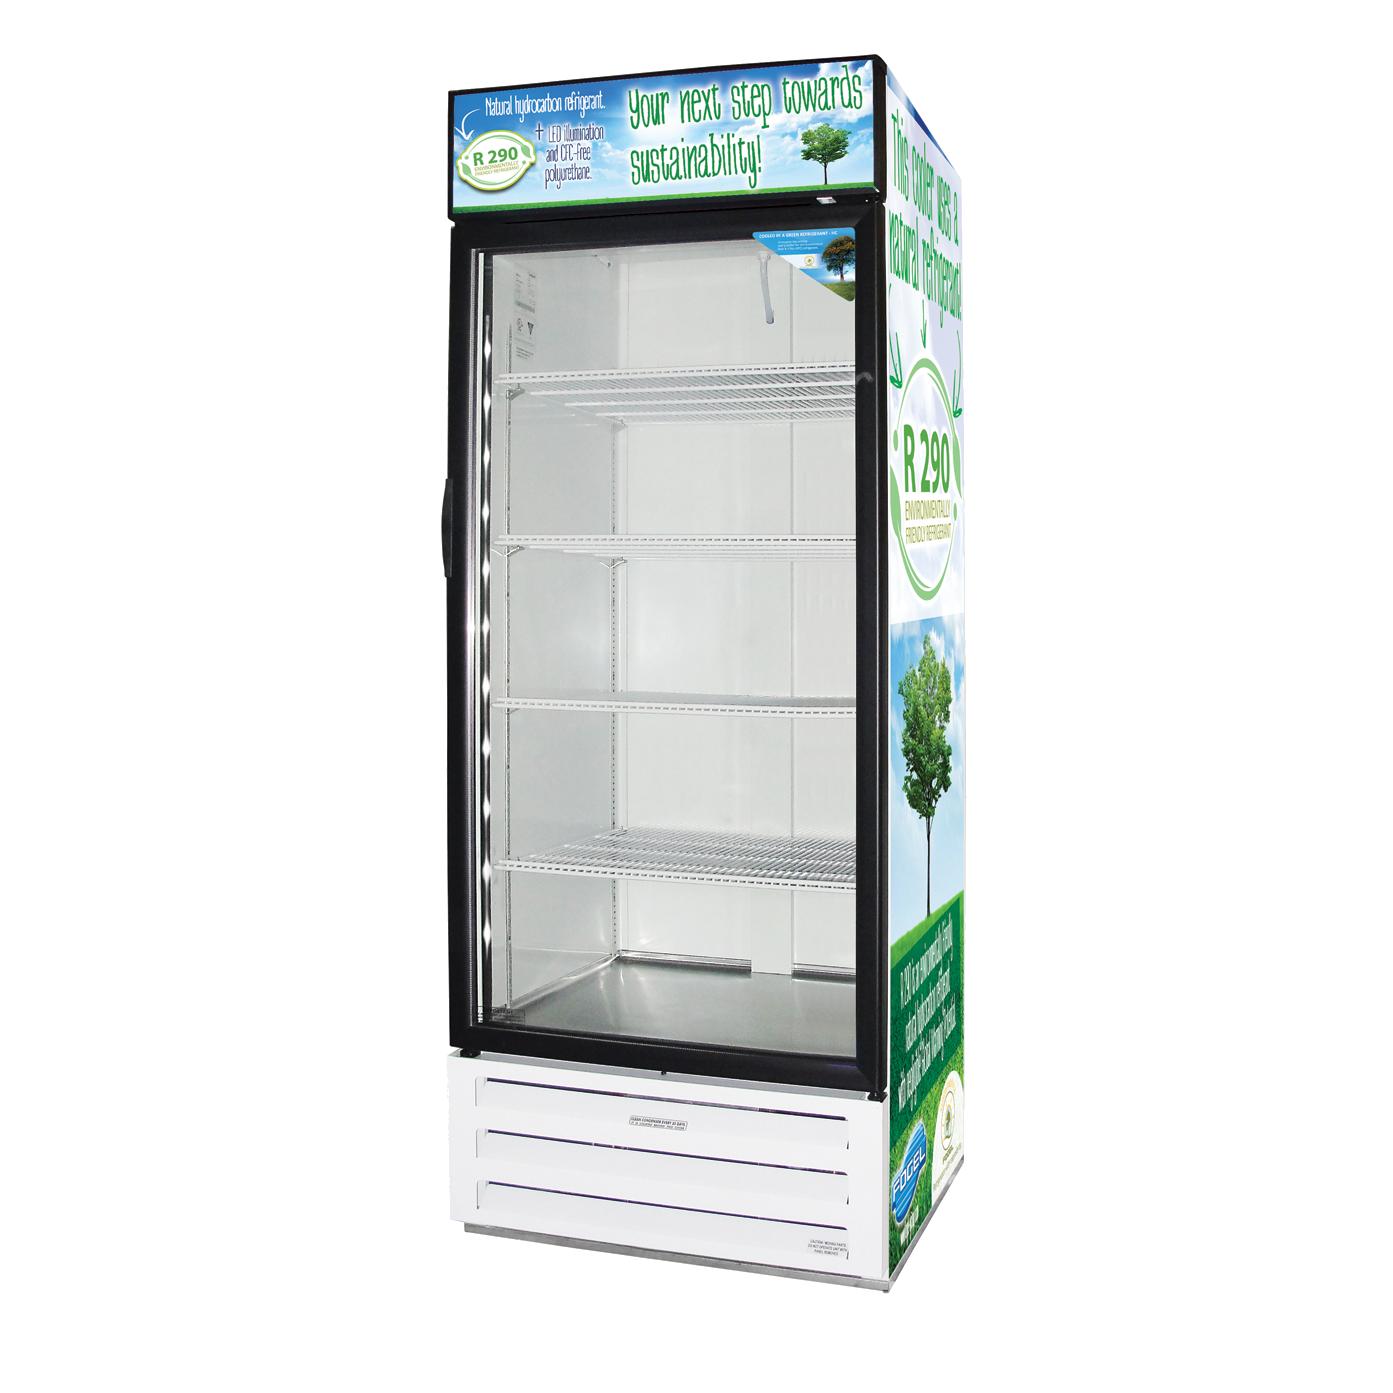 Fogel USA VR-26-HC refrigerator, merchandiser